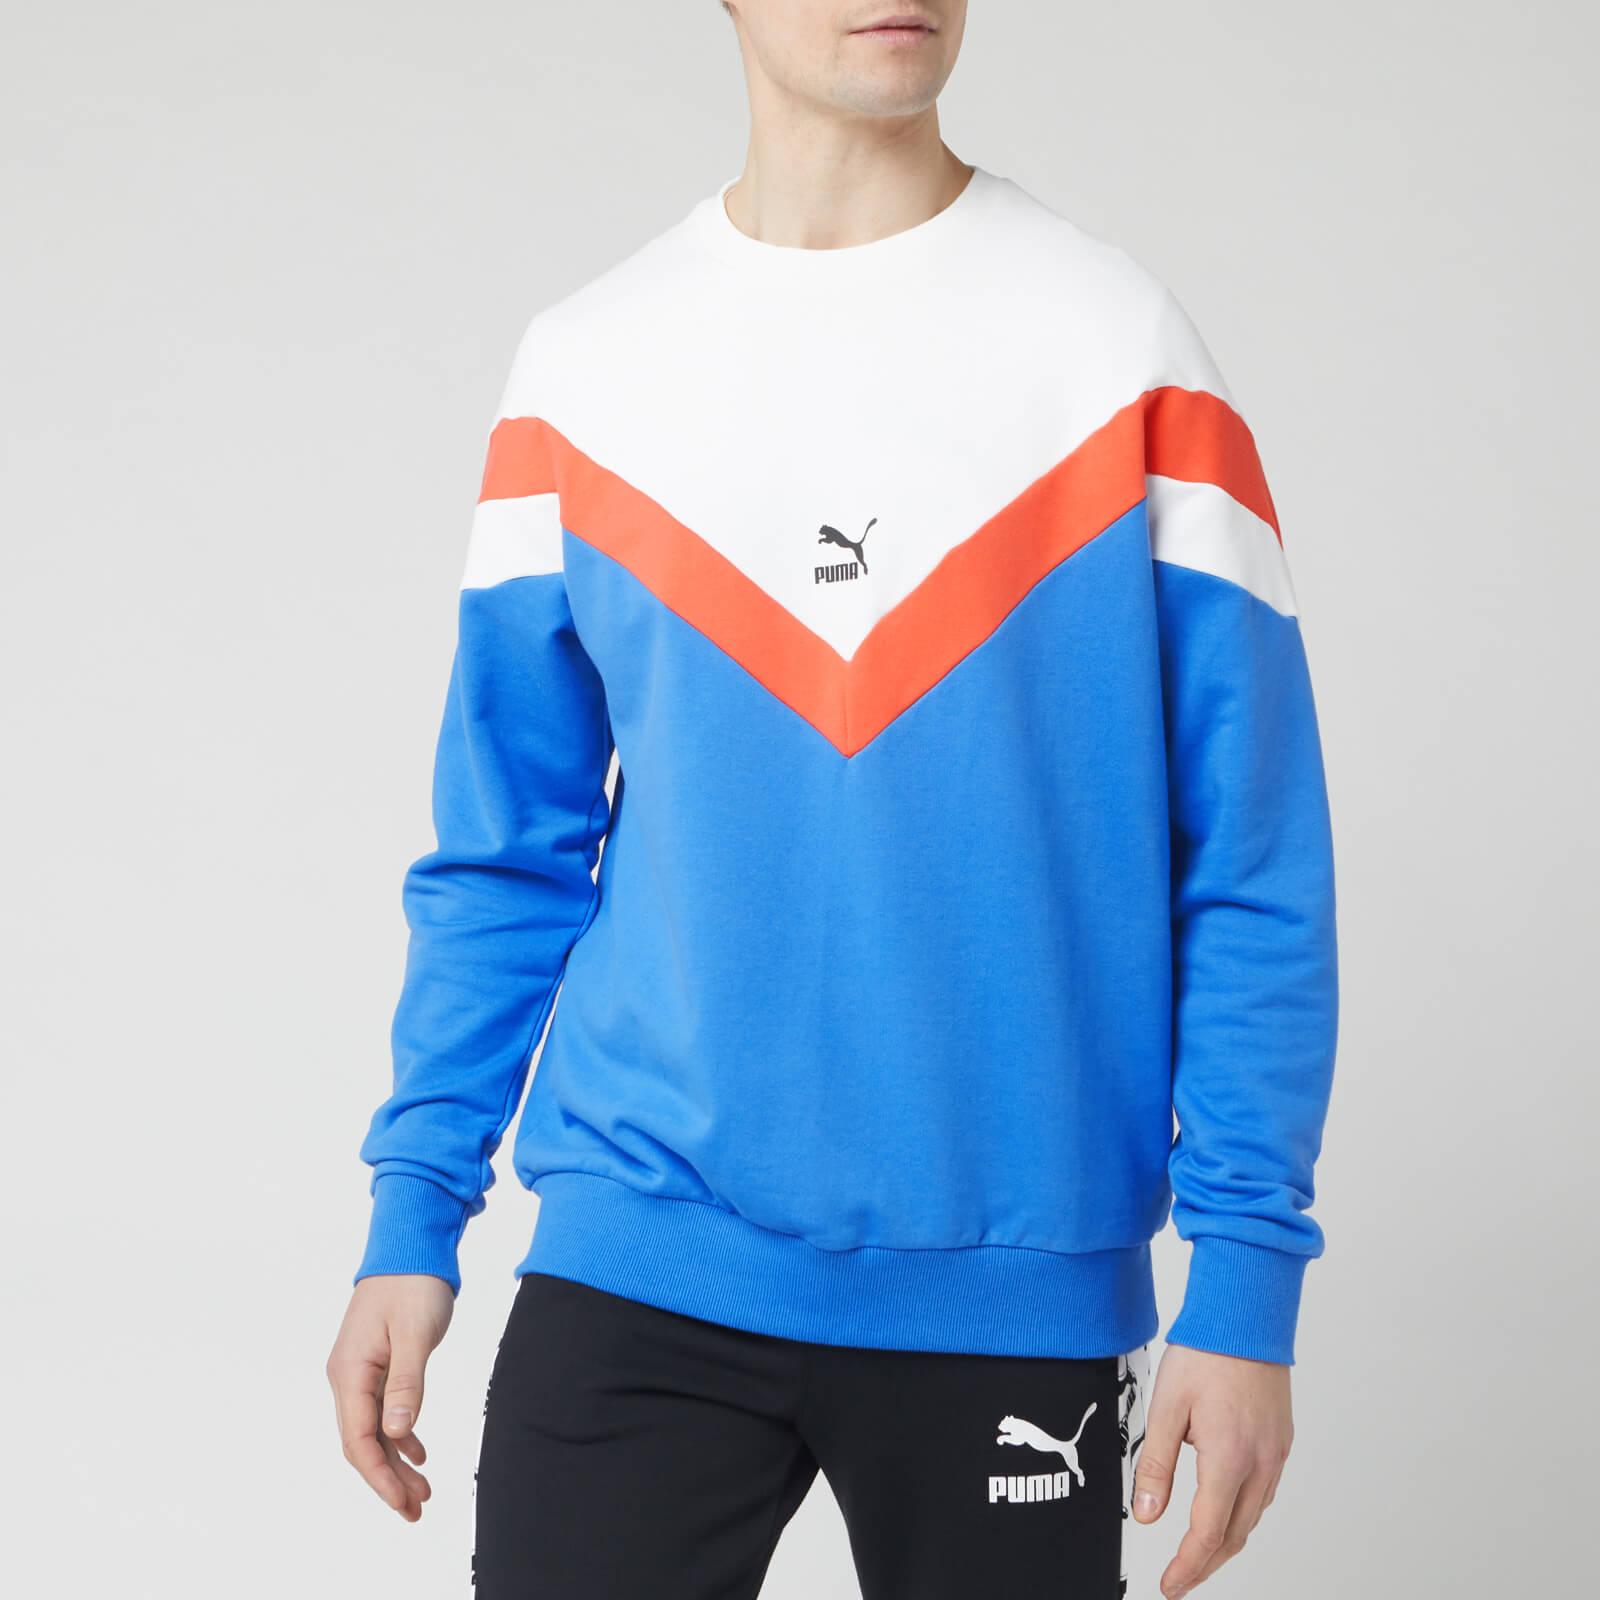 puma sweatshirt red white blue